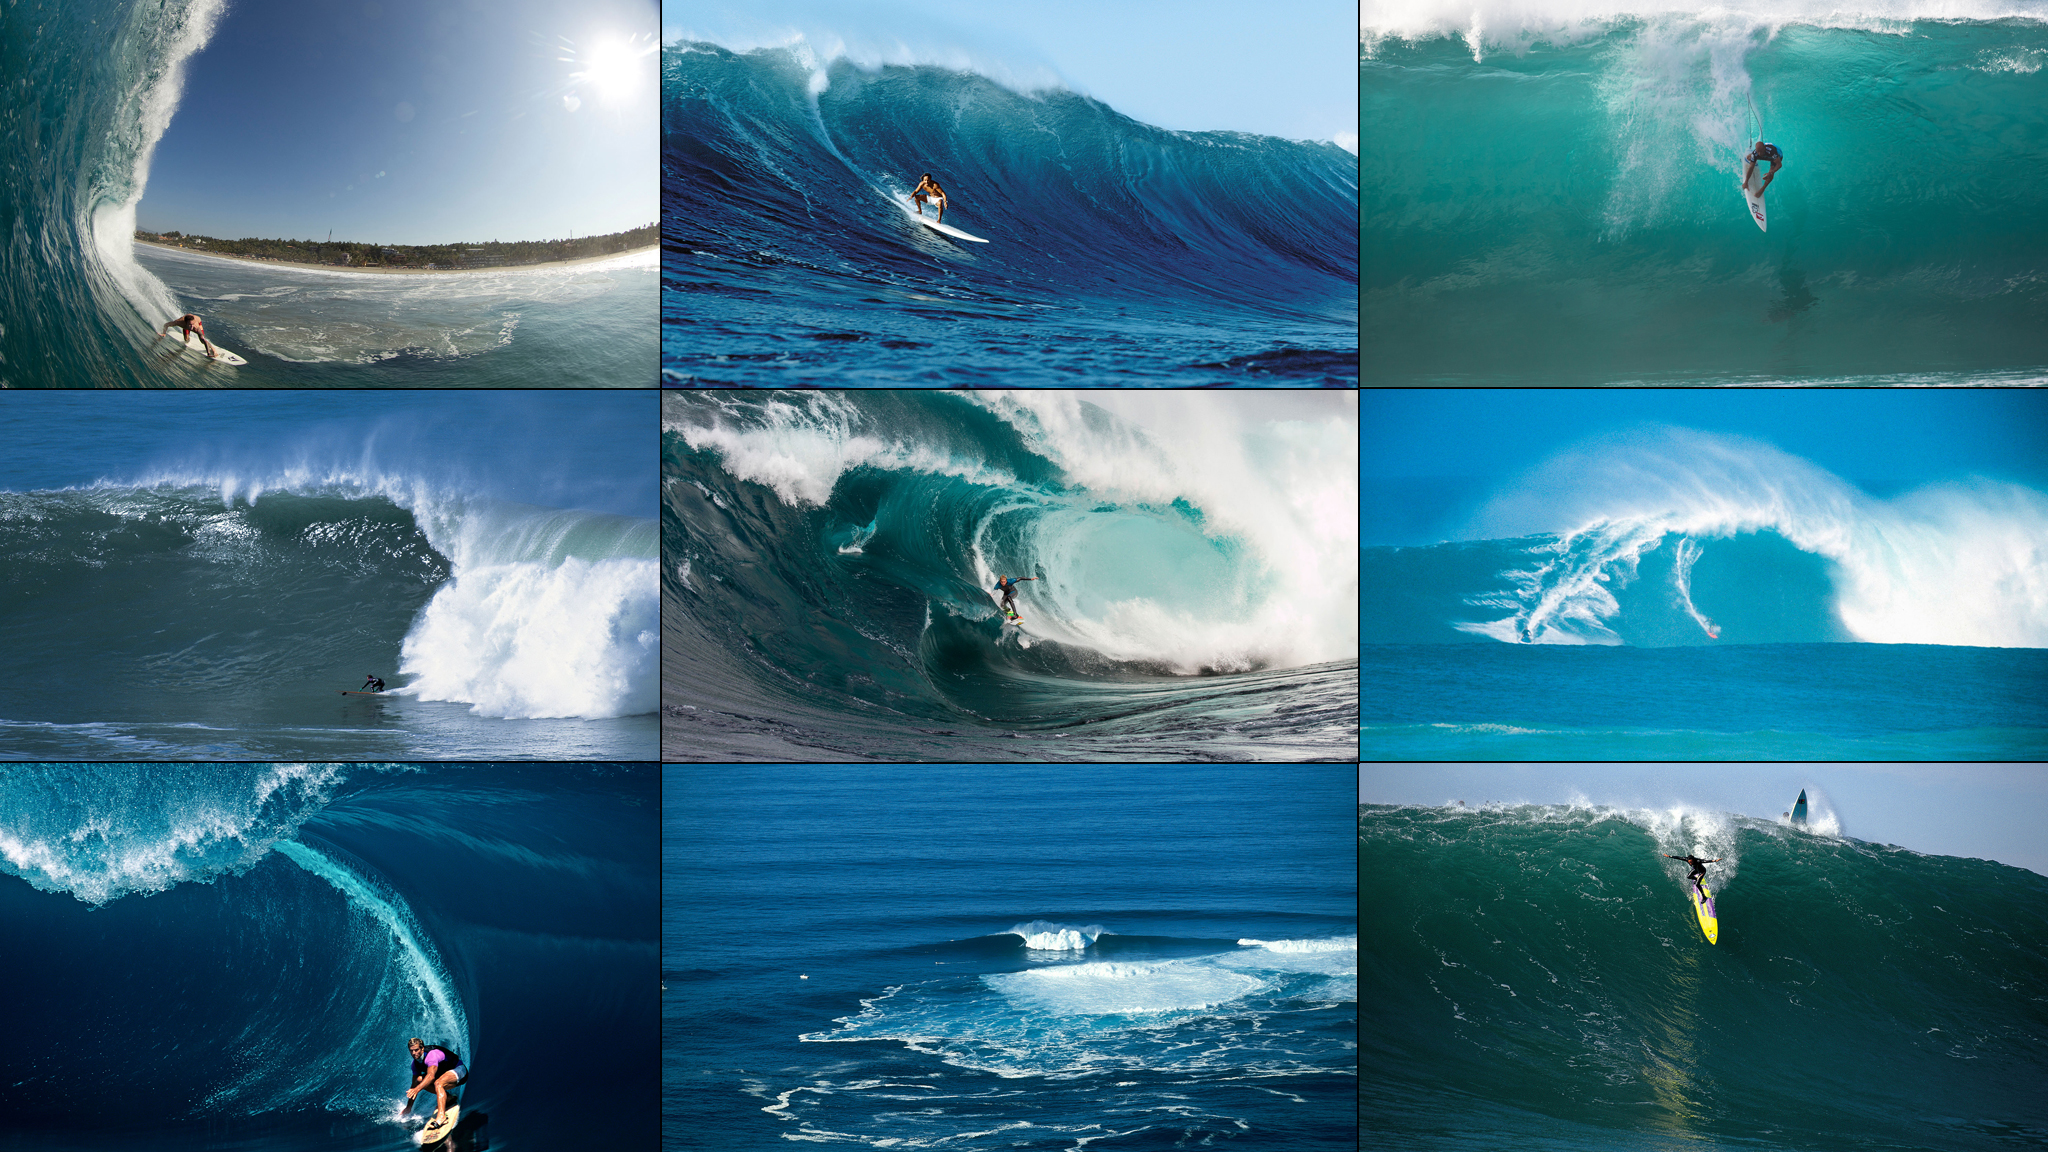 Surveying Big Wave Surfing